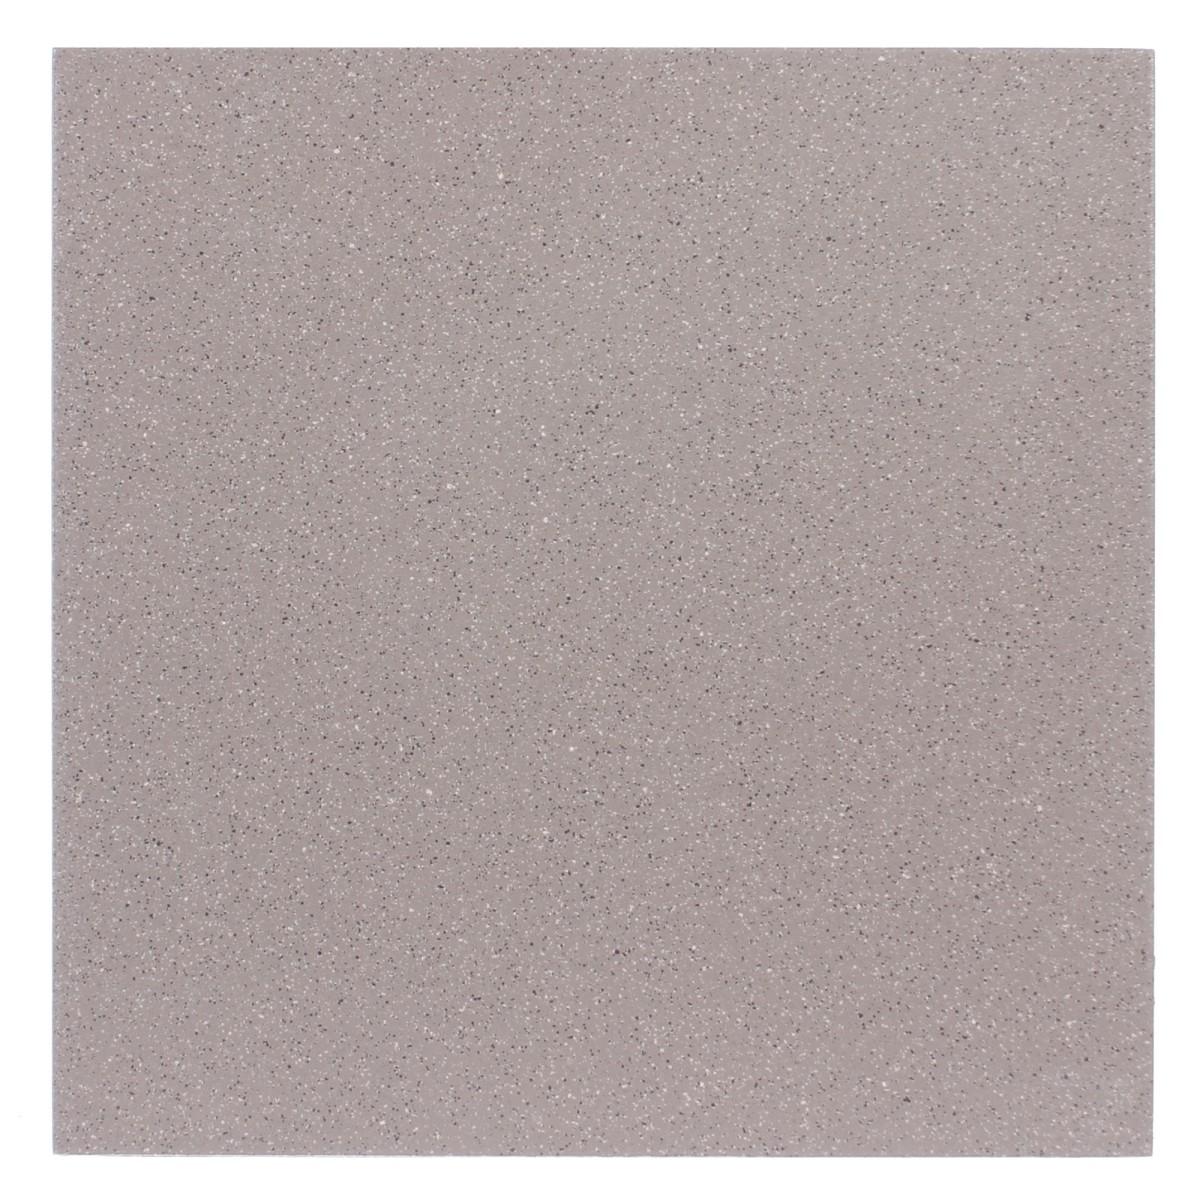 Керамогранит 30х30 см 1.53 м2 цвет серый